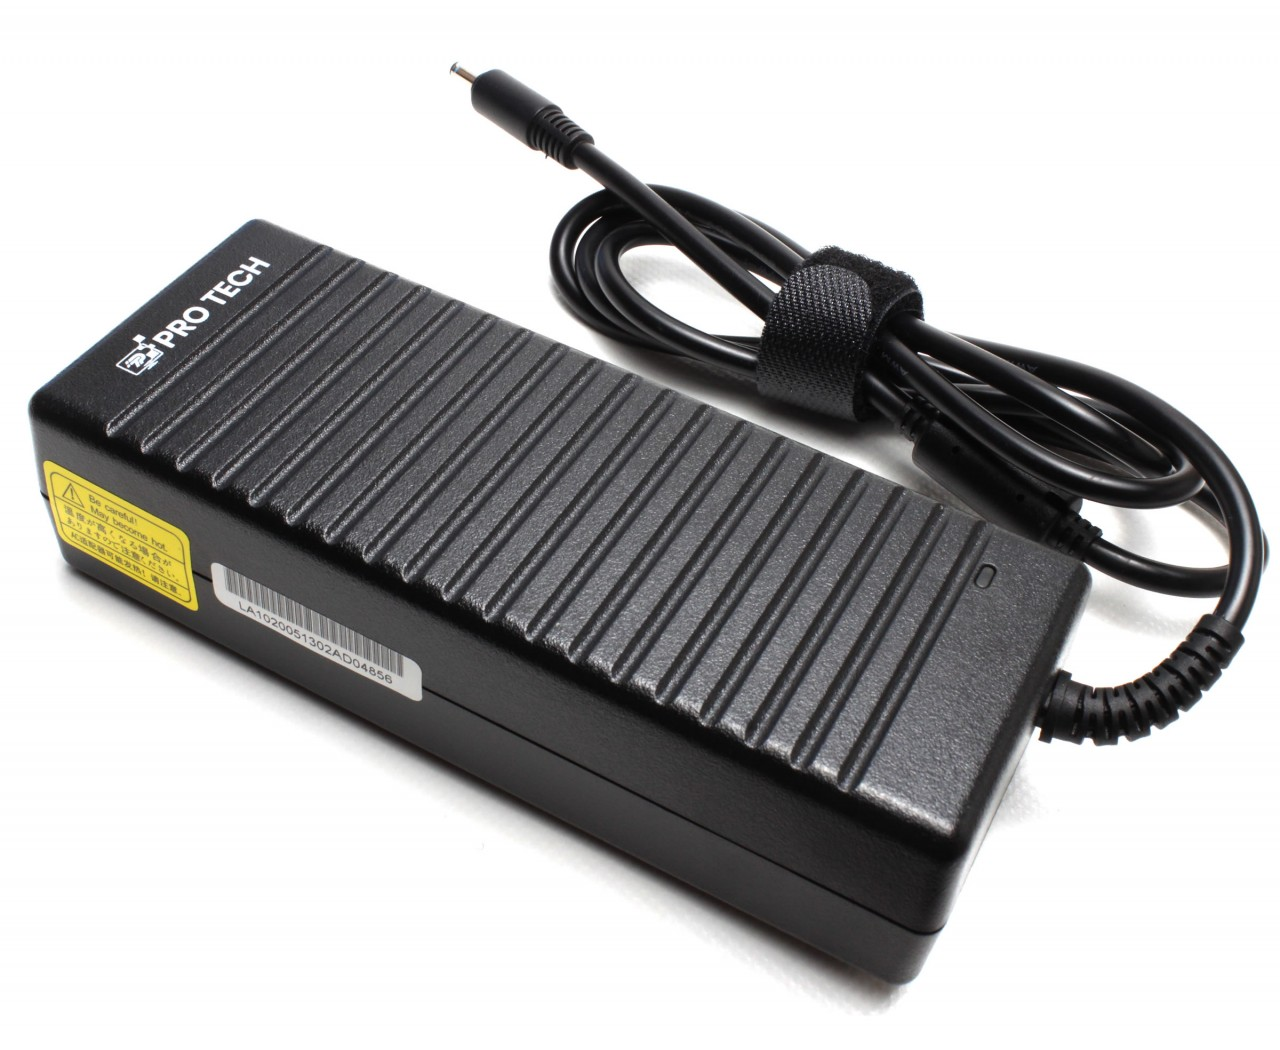 Incarcator Dell Precision 15 5510 130W Replacement imagine powerlaptop.ro 2021